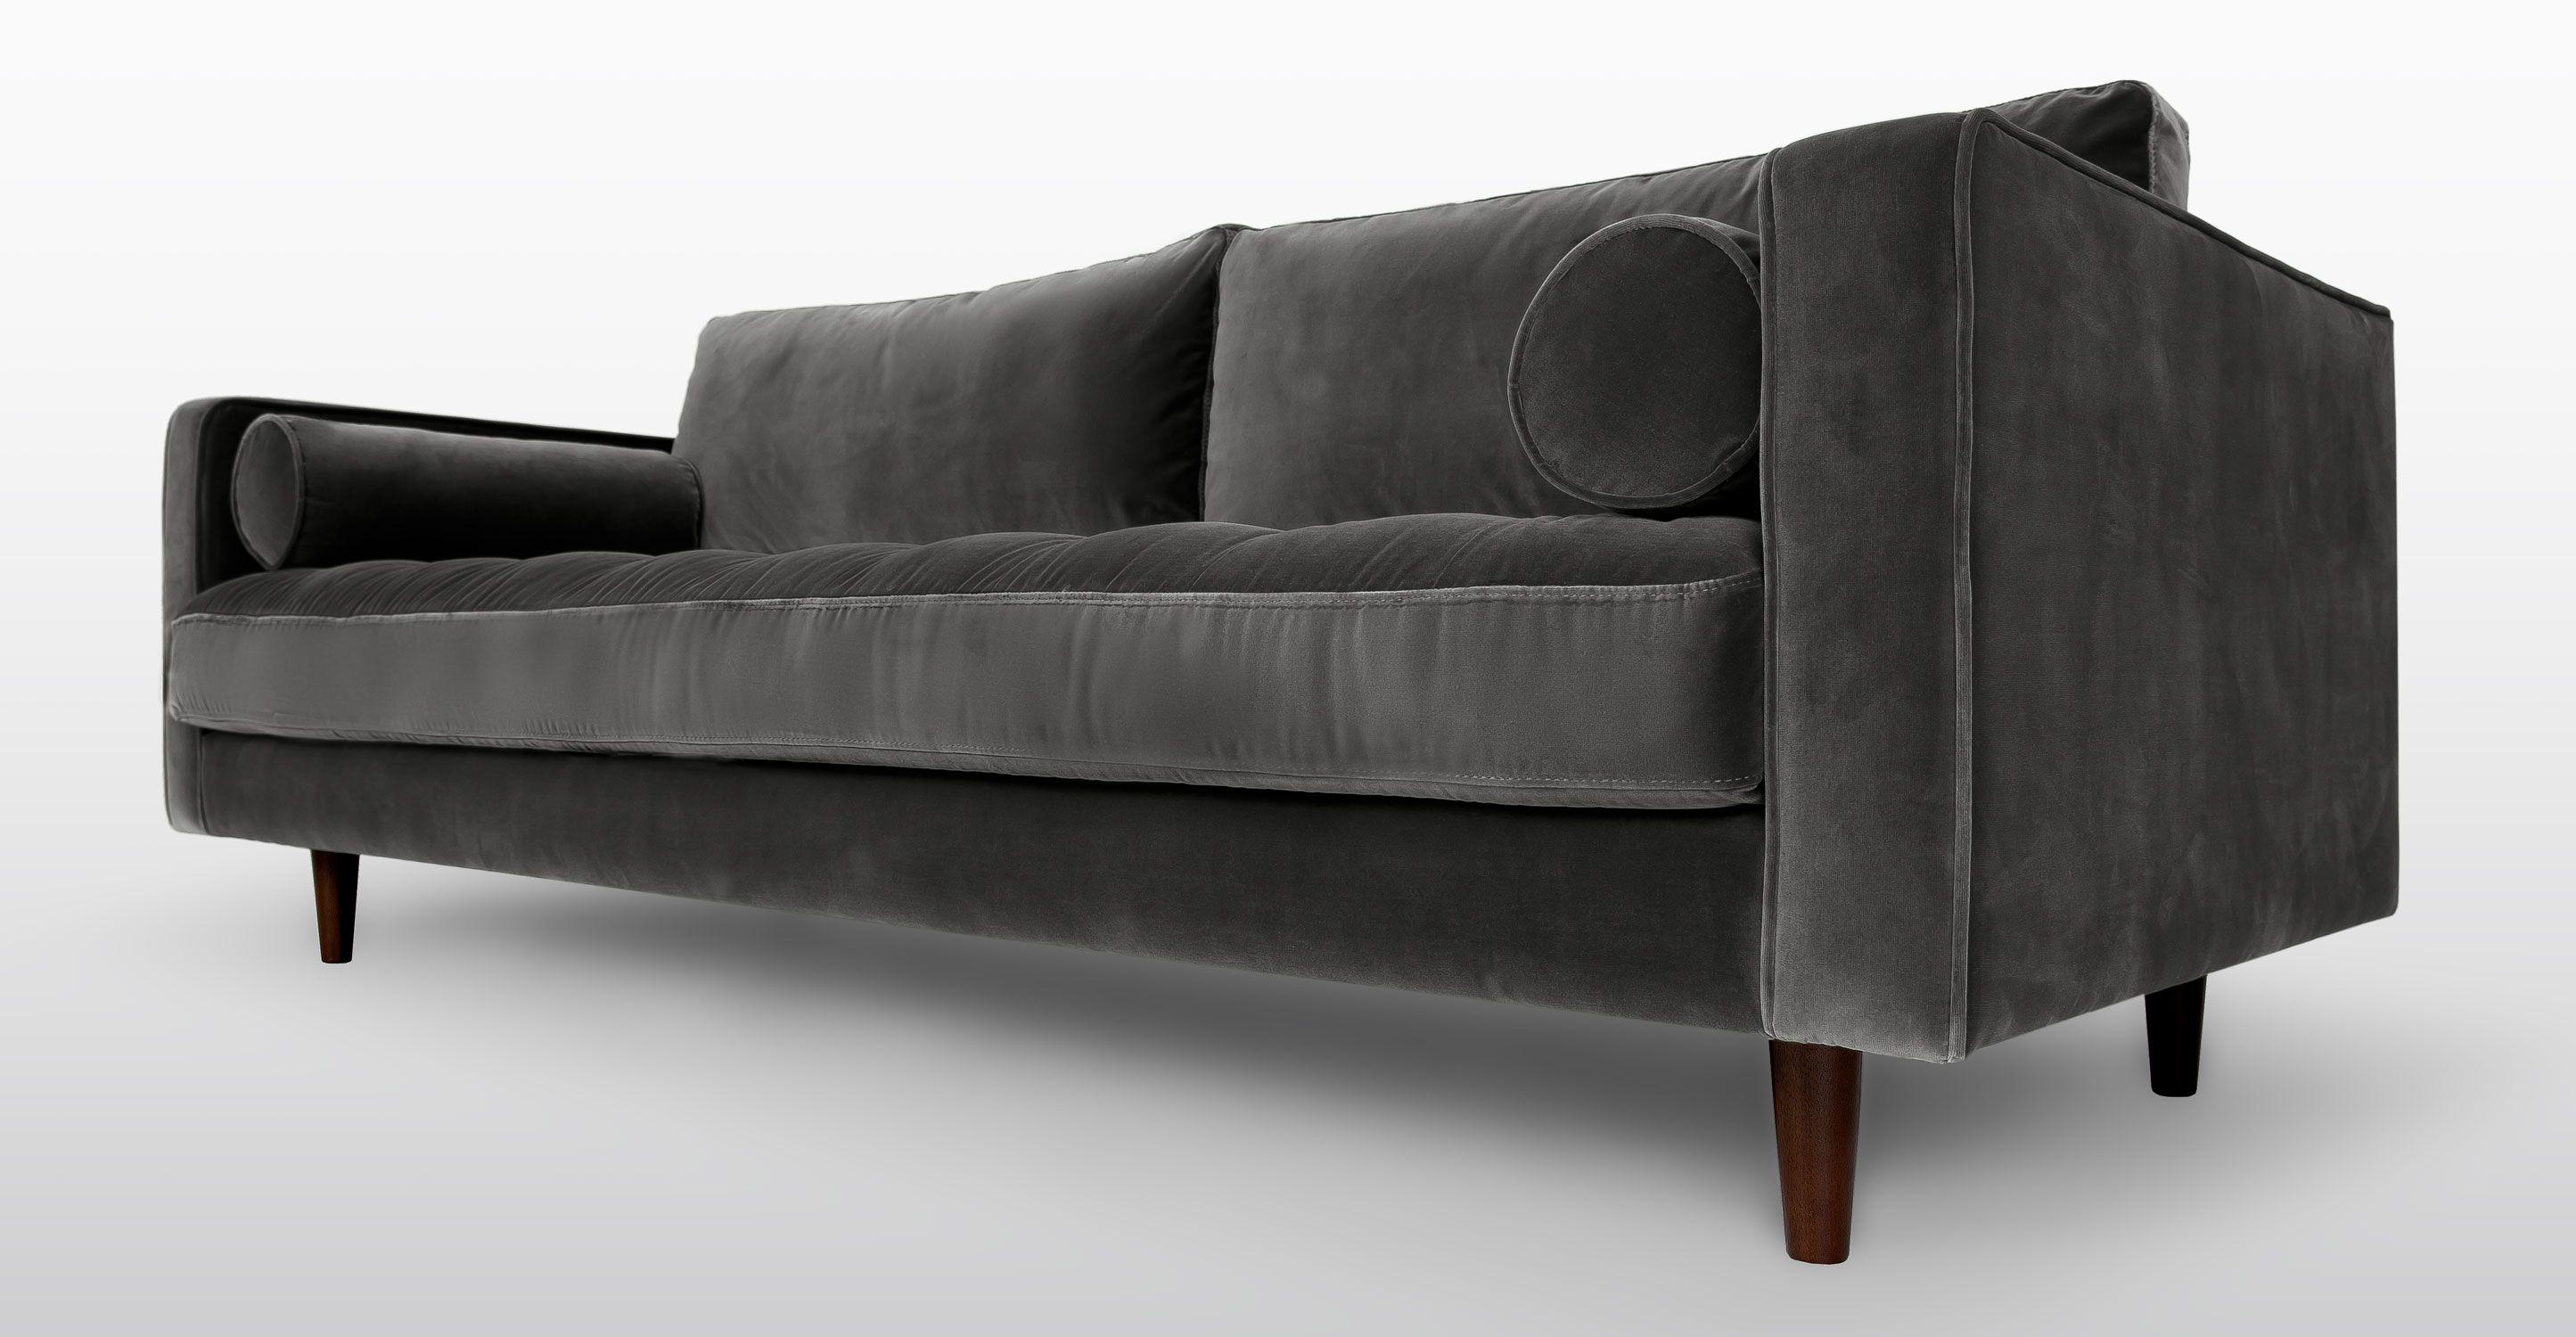 Sven shadow gray sofa sofas article modern mid century and scandinavian furniture